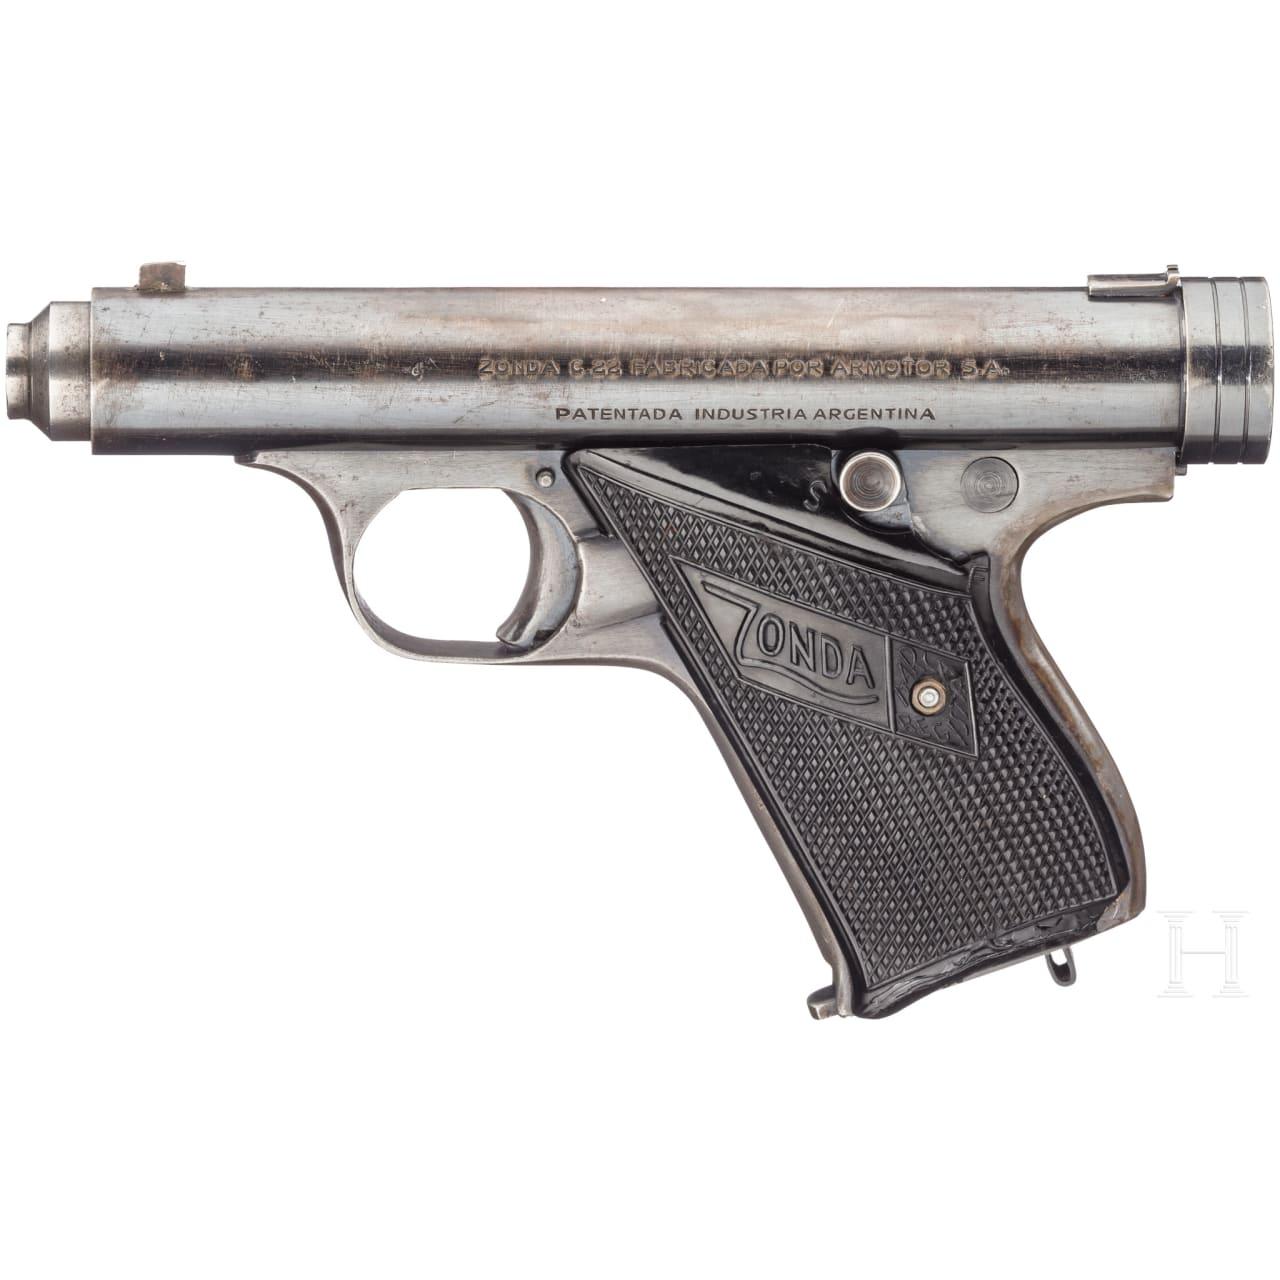 Pistole Zonda